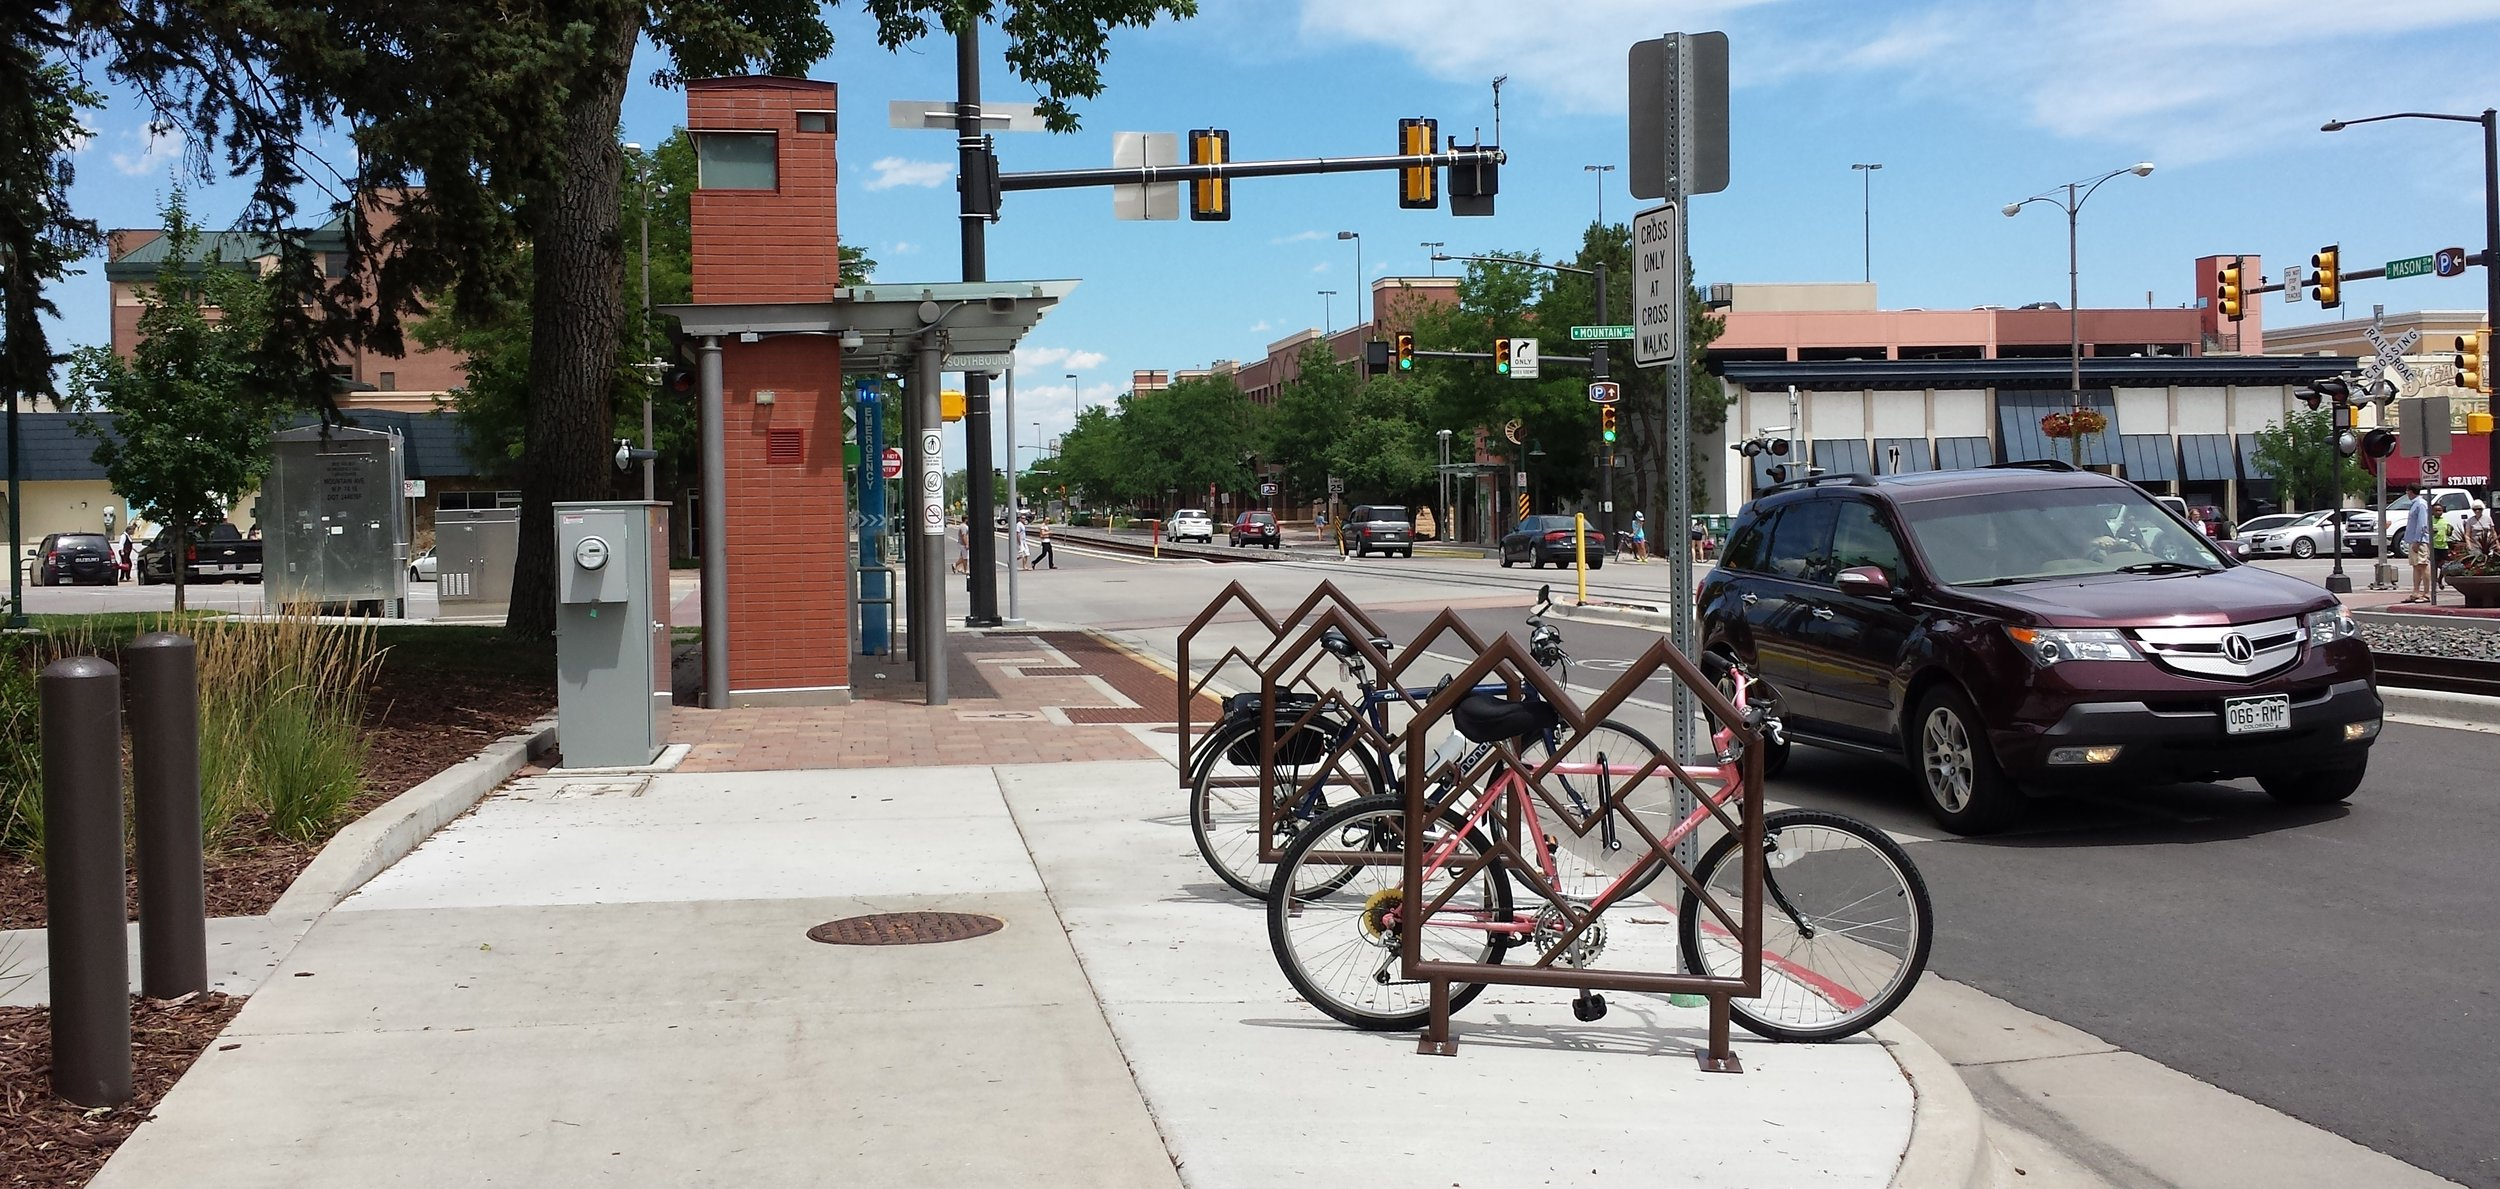 2014-07-21 MAX Bike racks resized.jpg